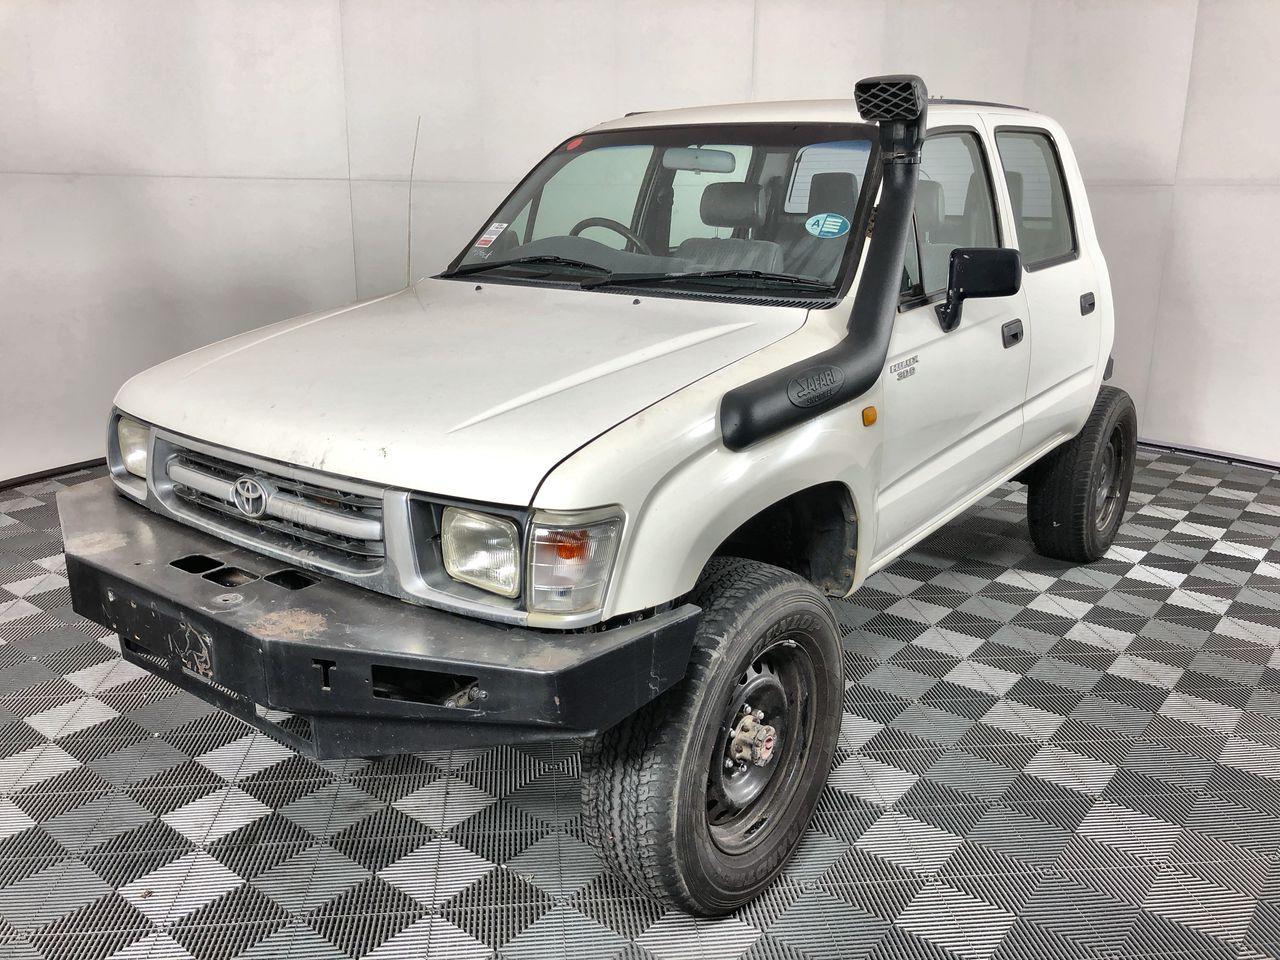 2000 Toyota Hilux (4x4) Turbo Diesel Dual Cab